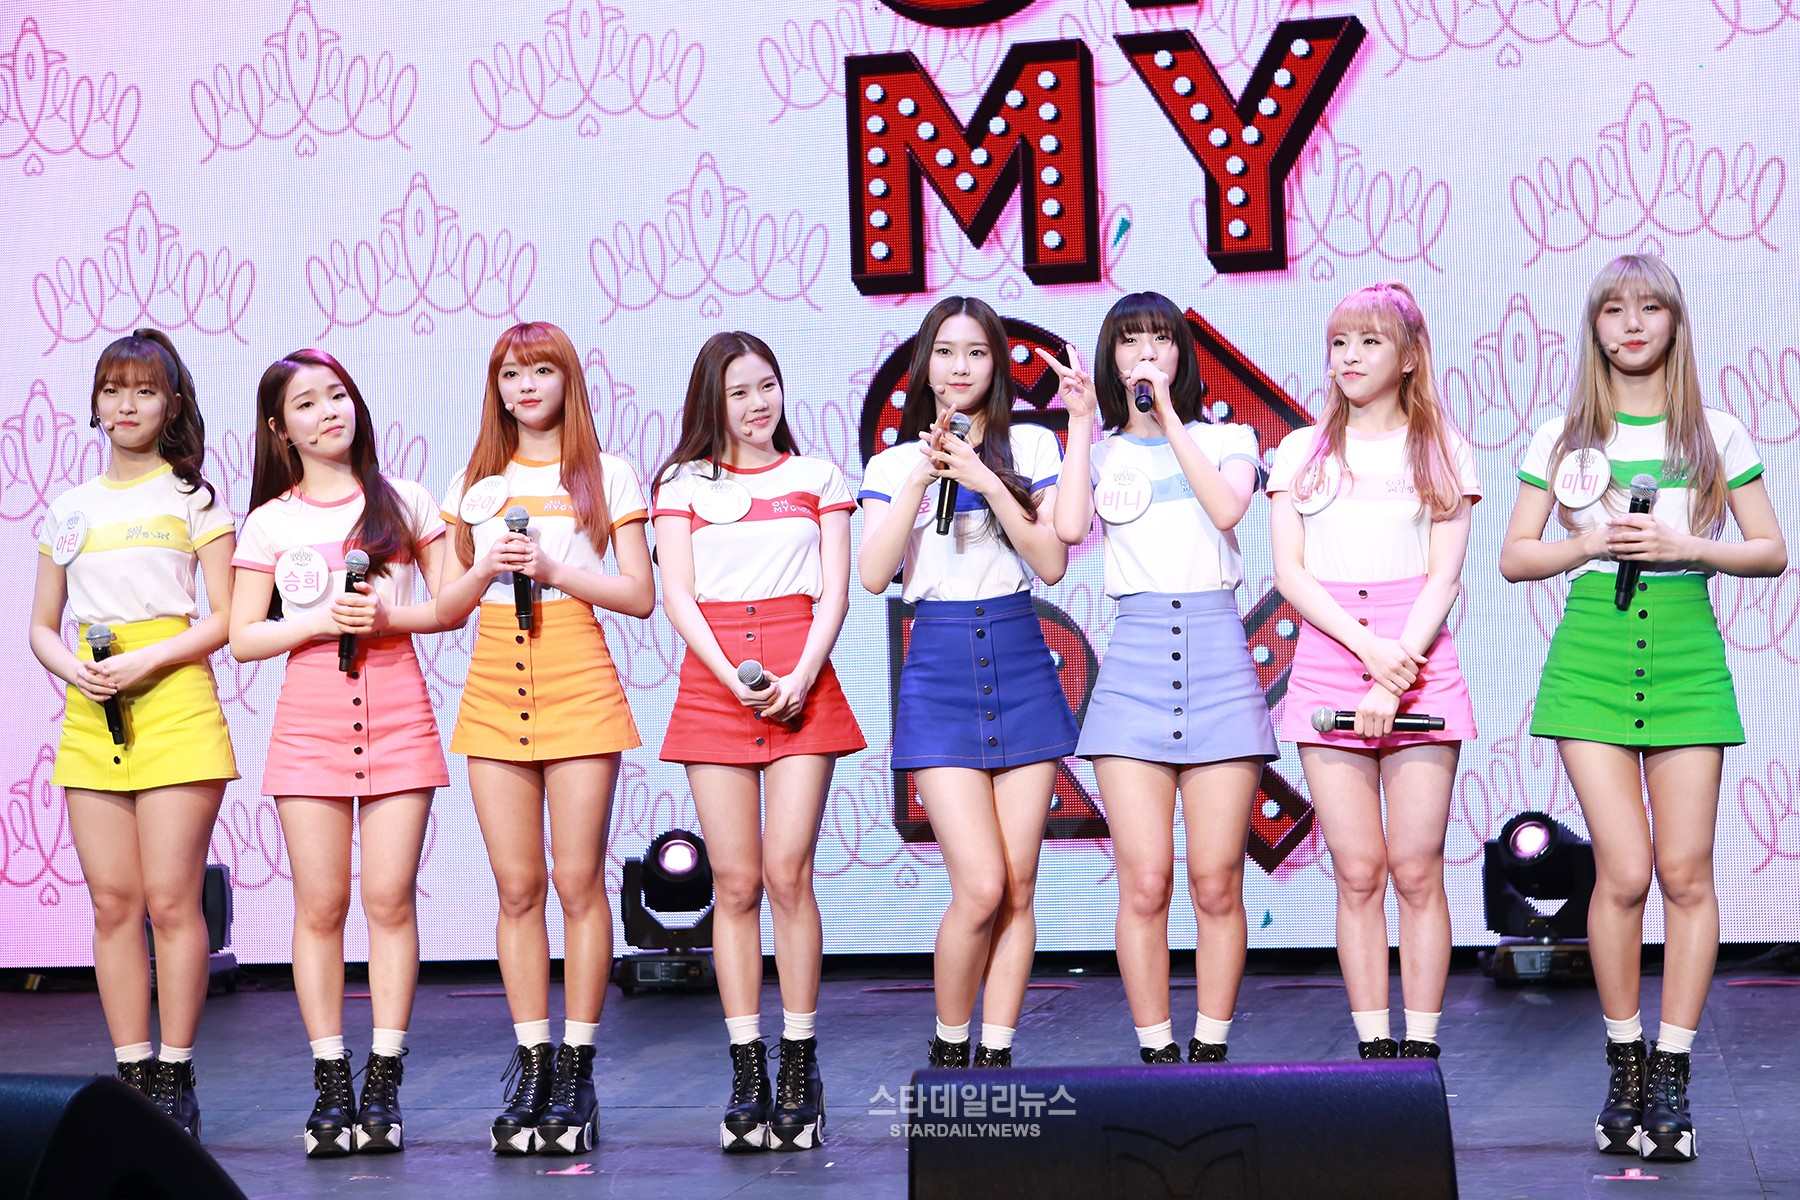 my members: